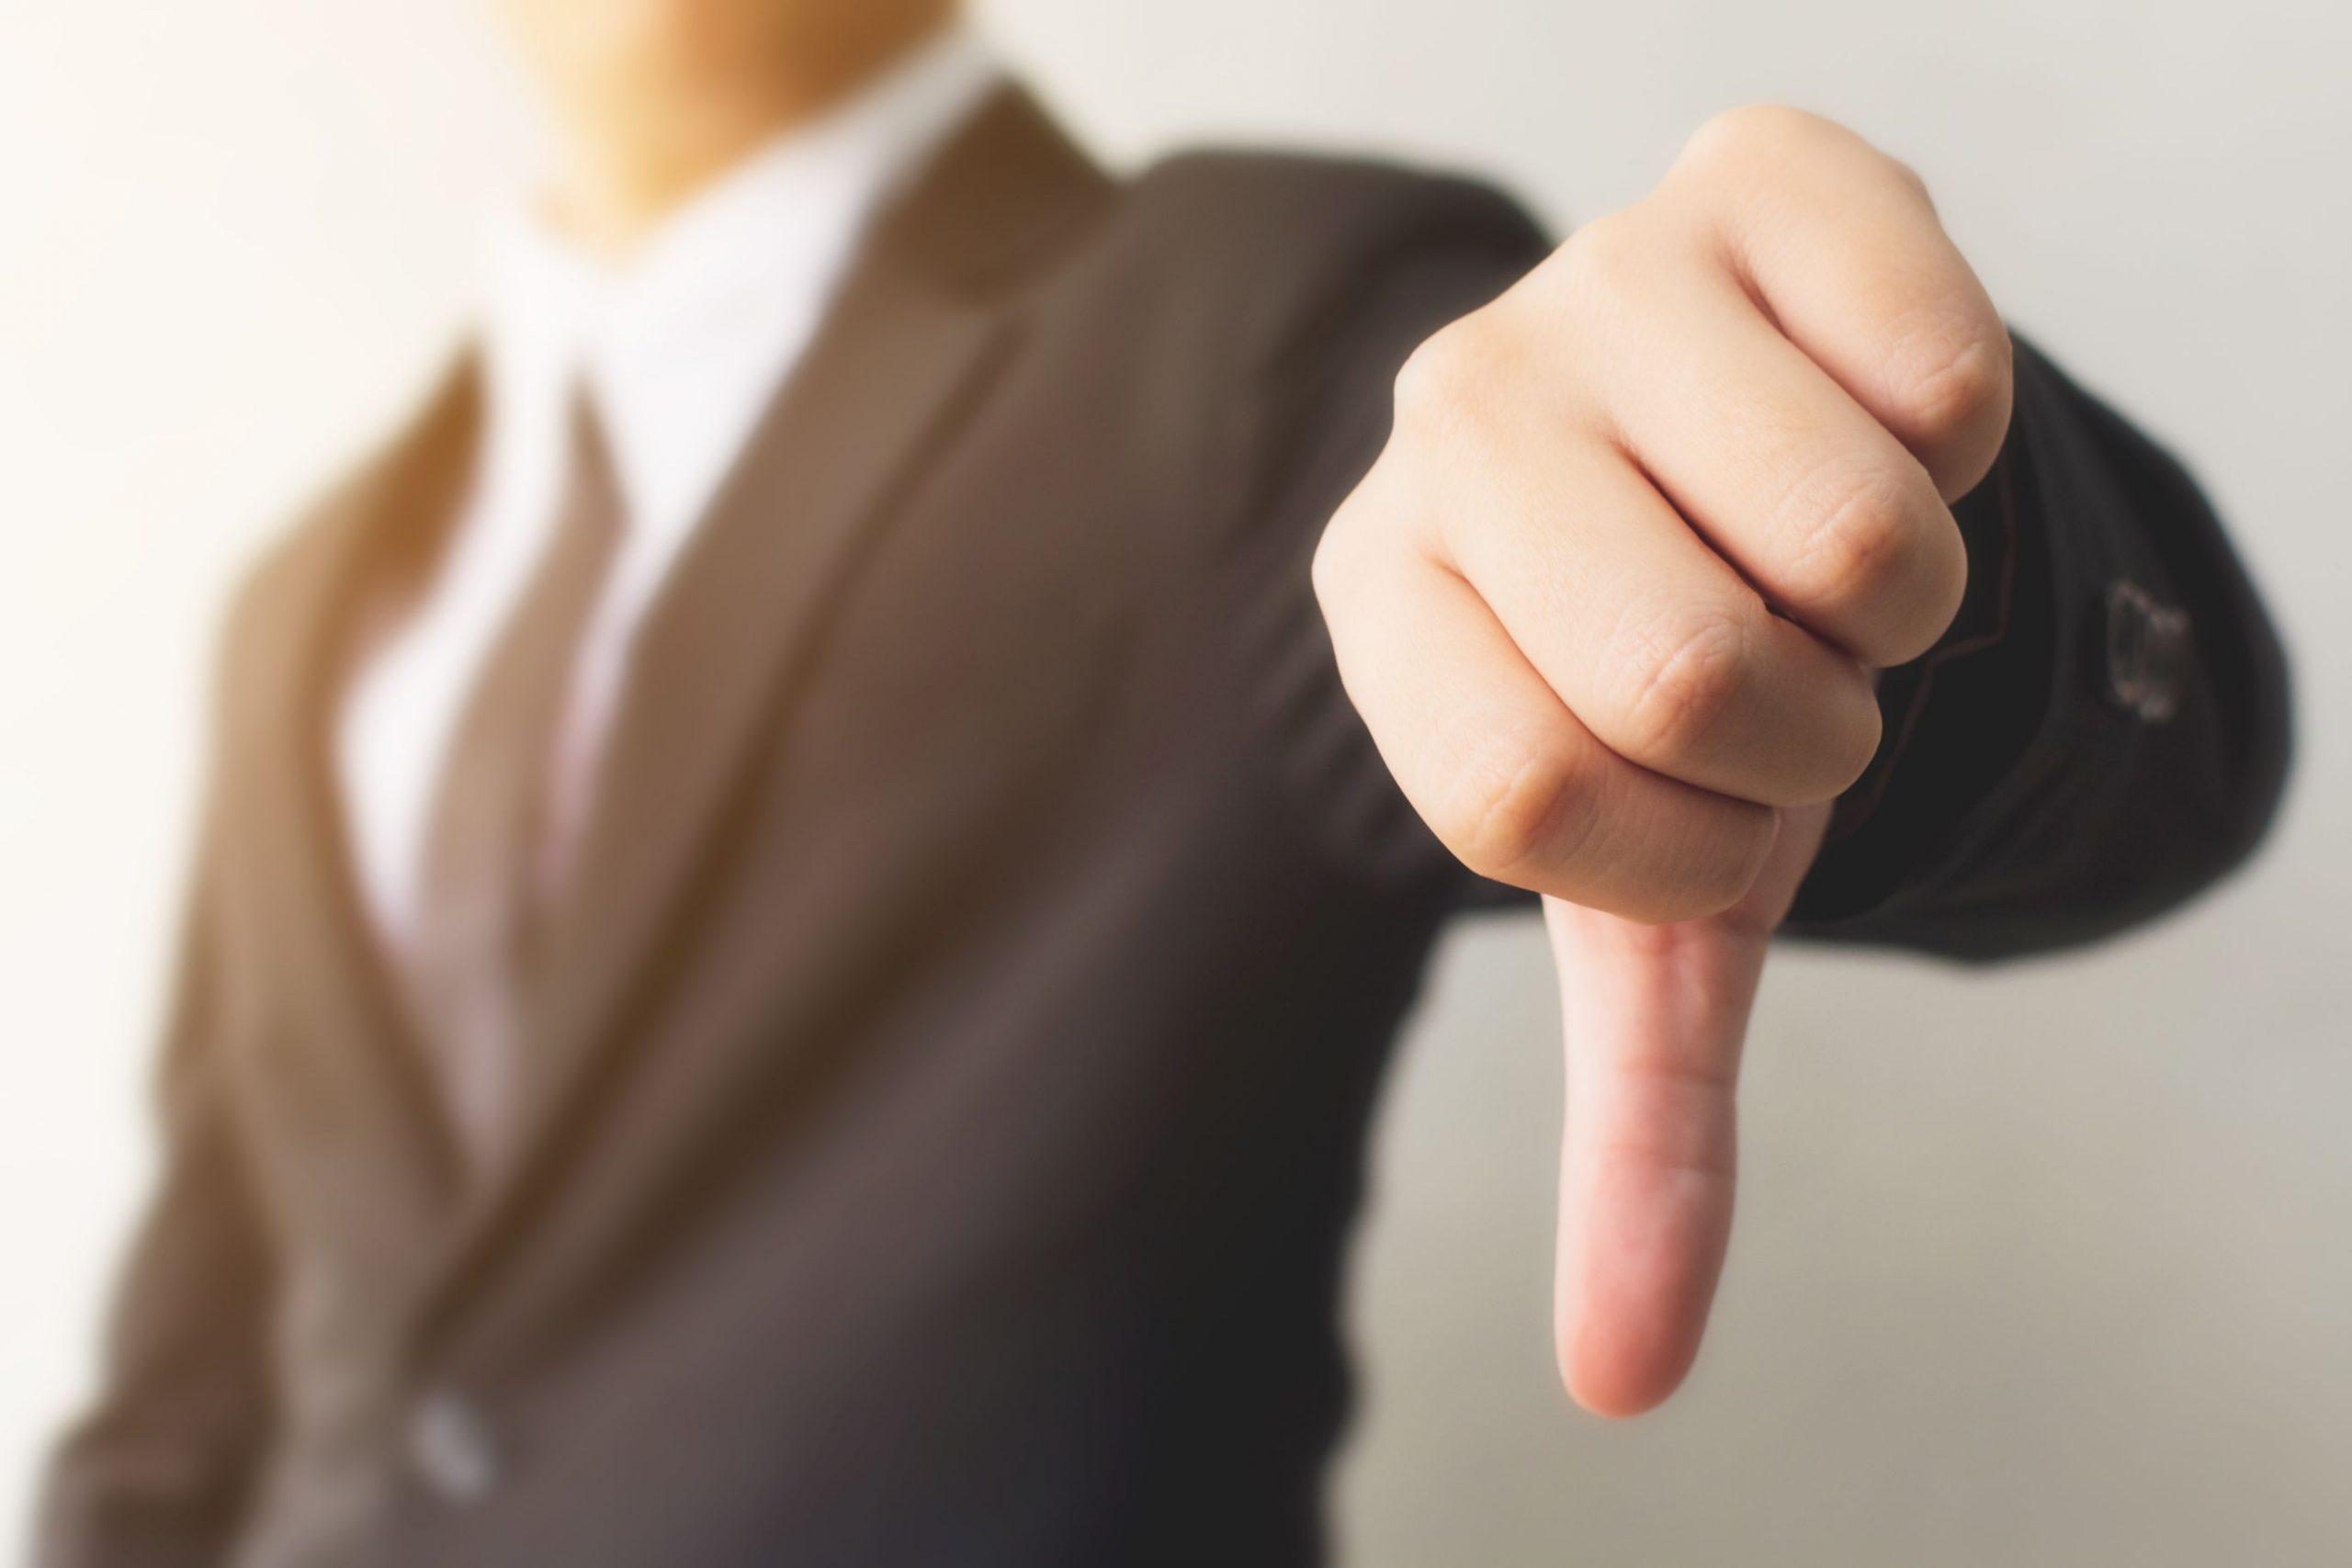 assureur refus indemnisation sinistre